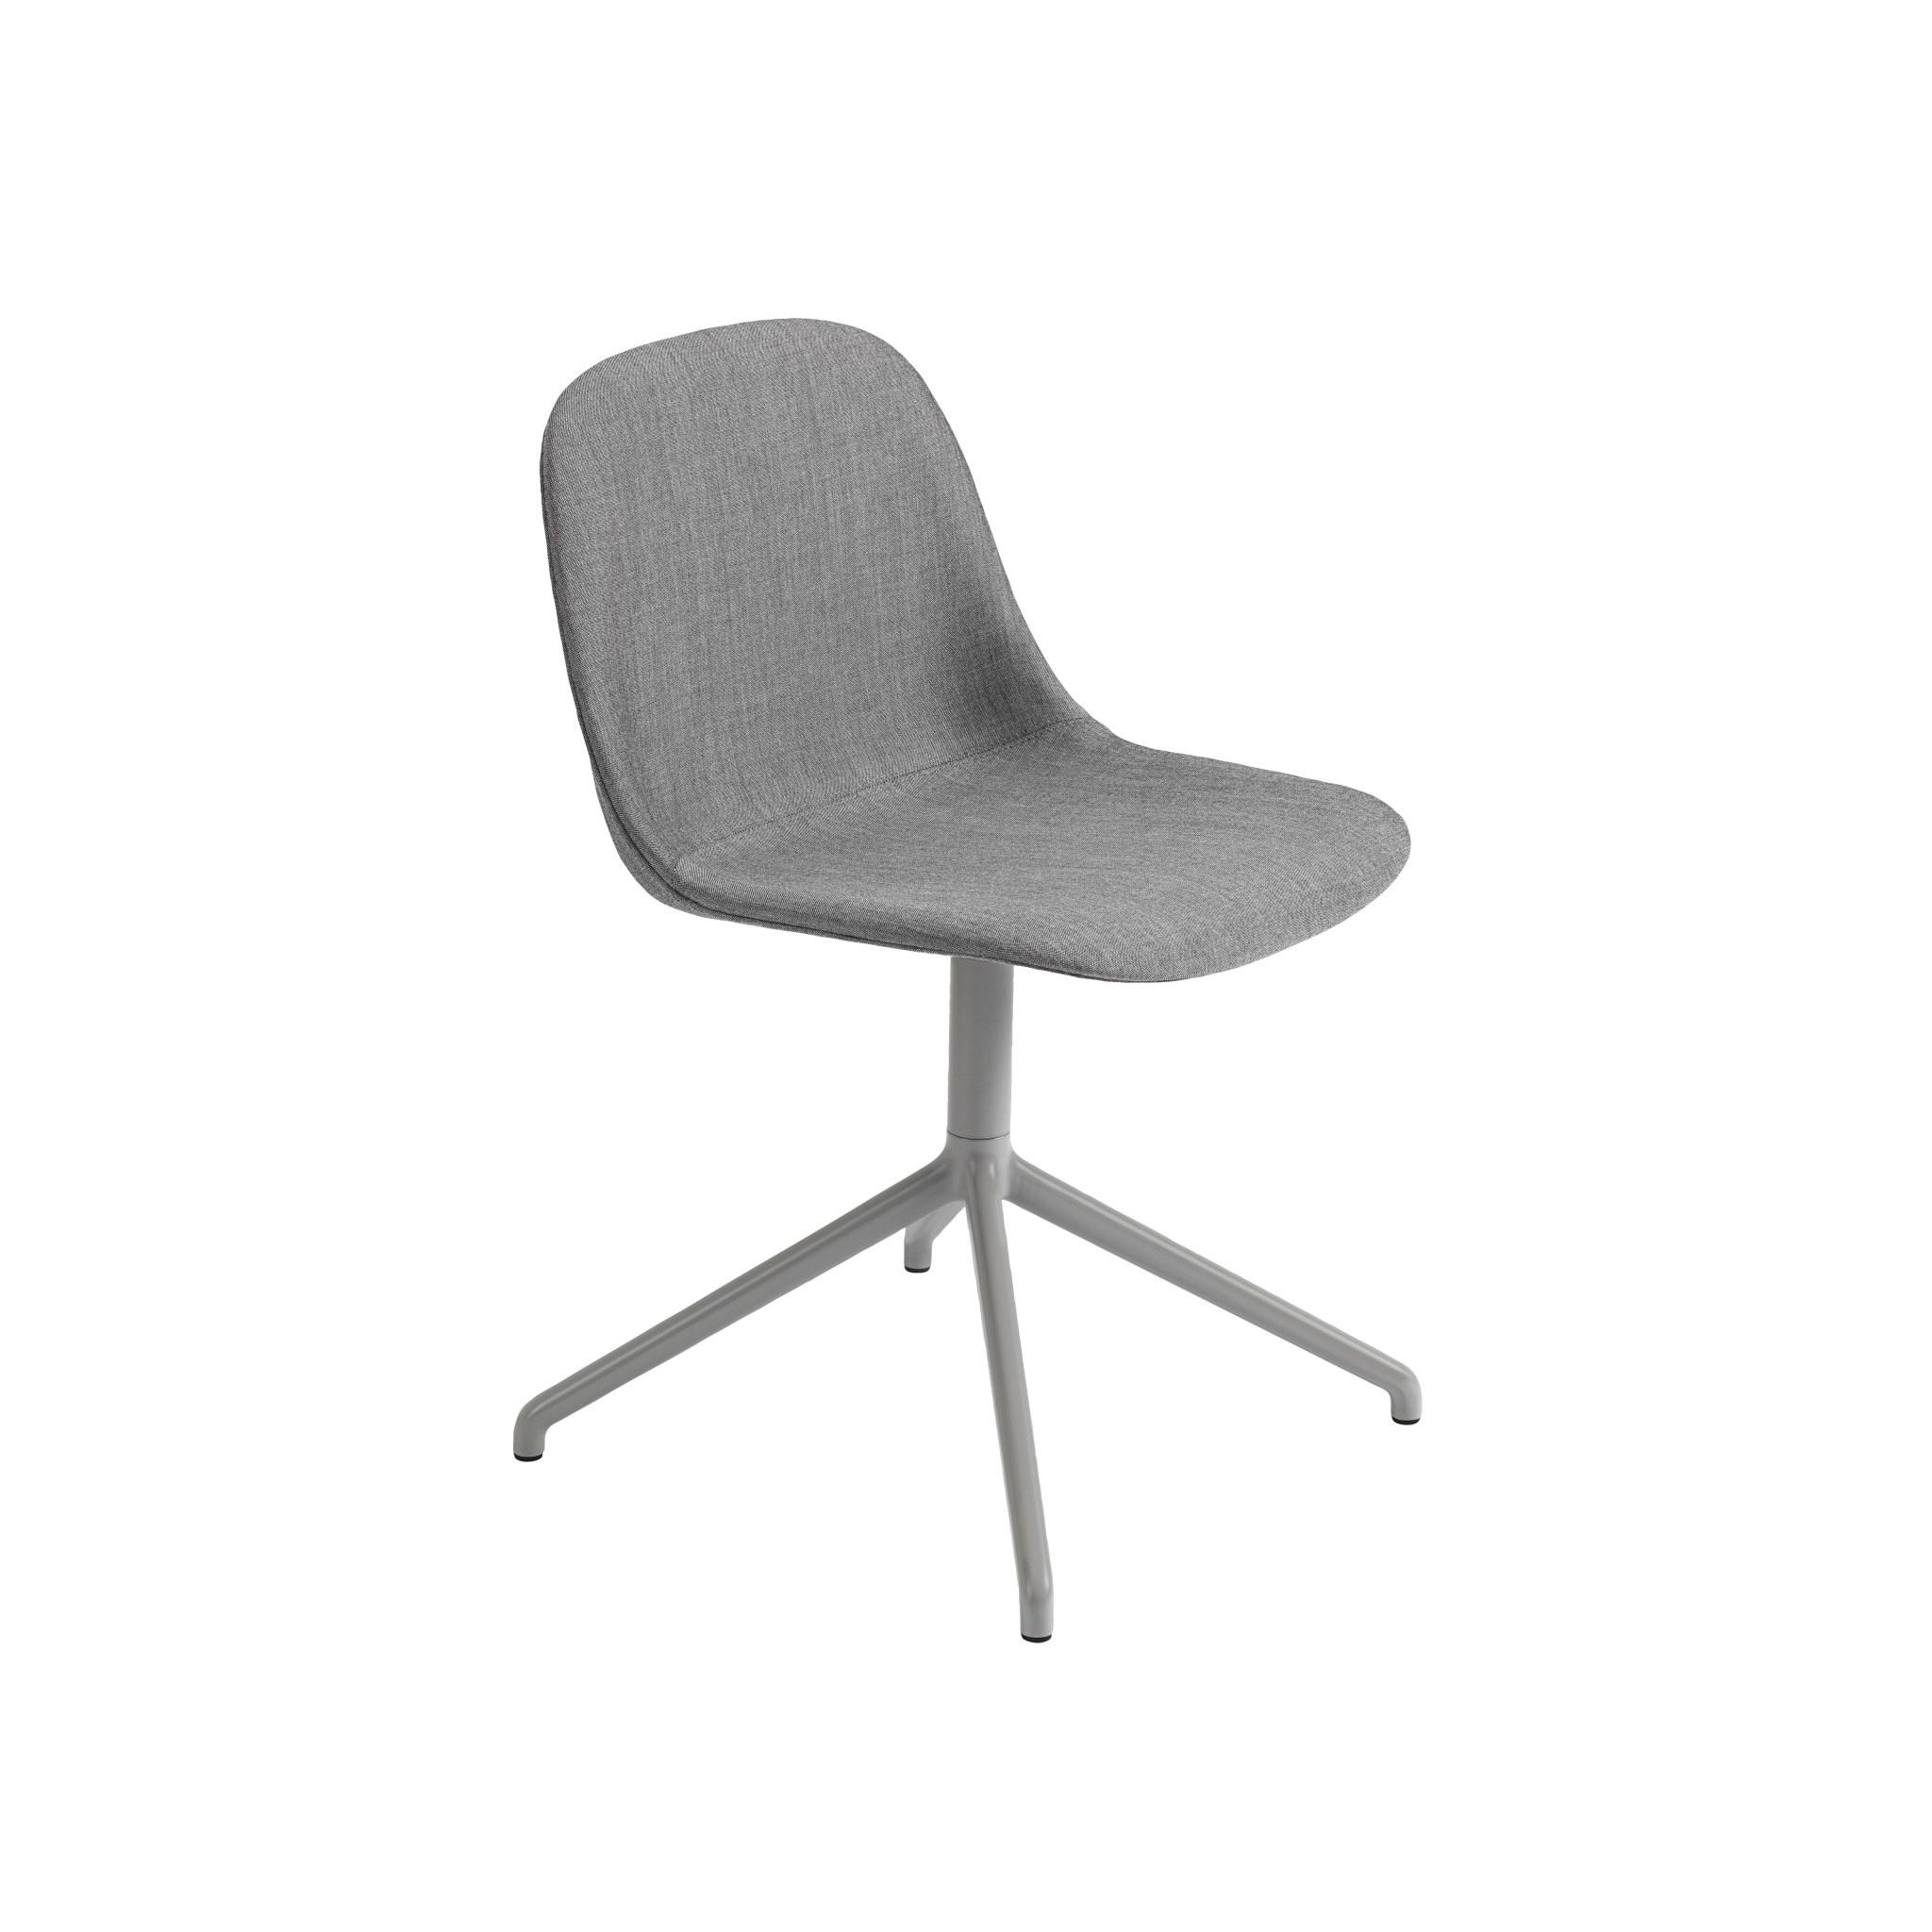 Fiber side chair swivel base w.o. return-7